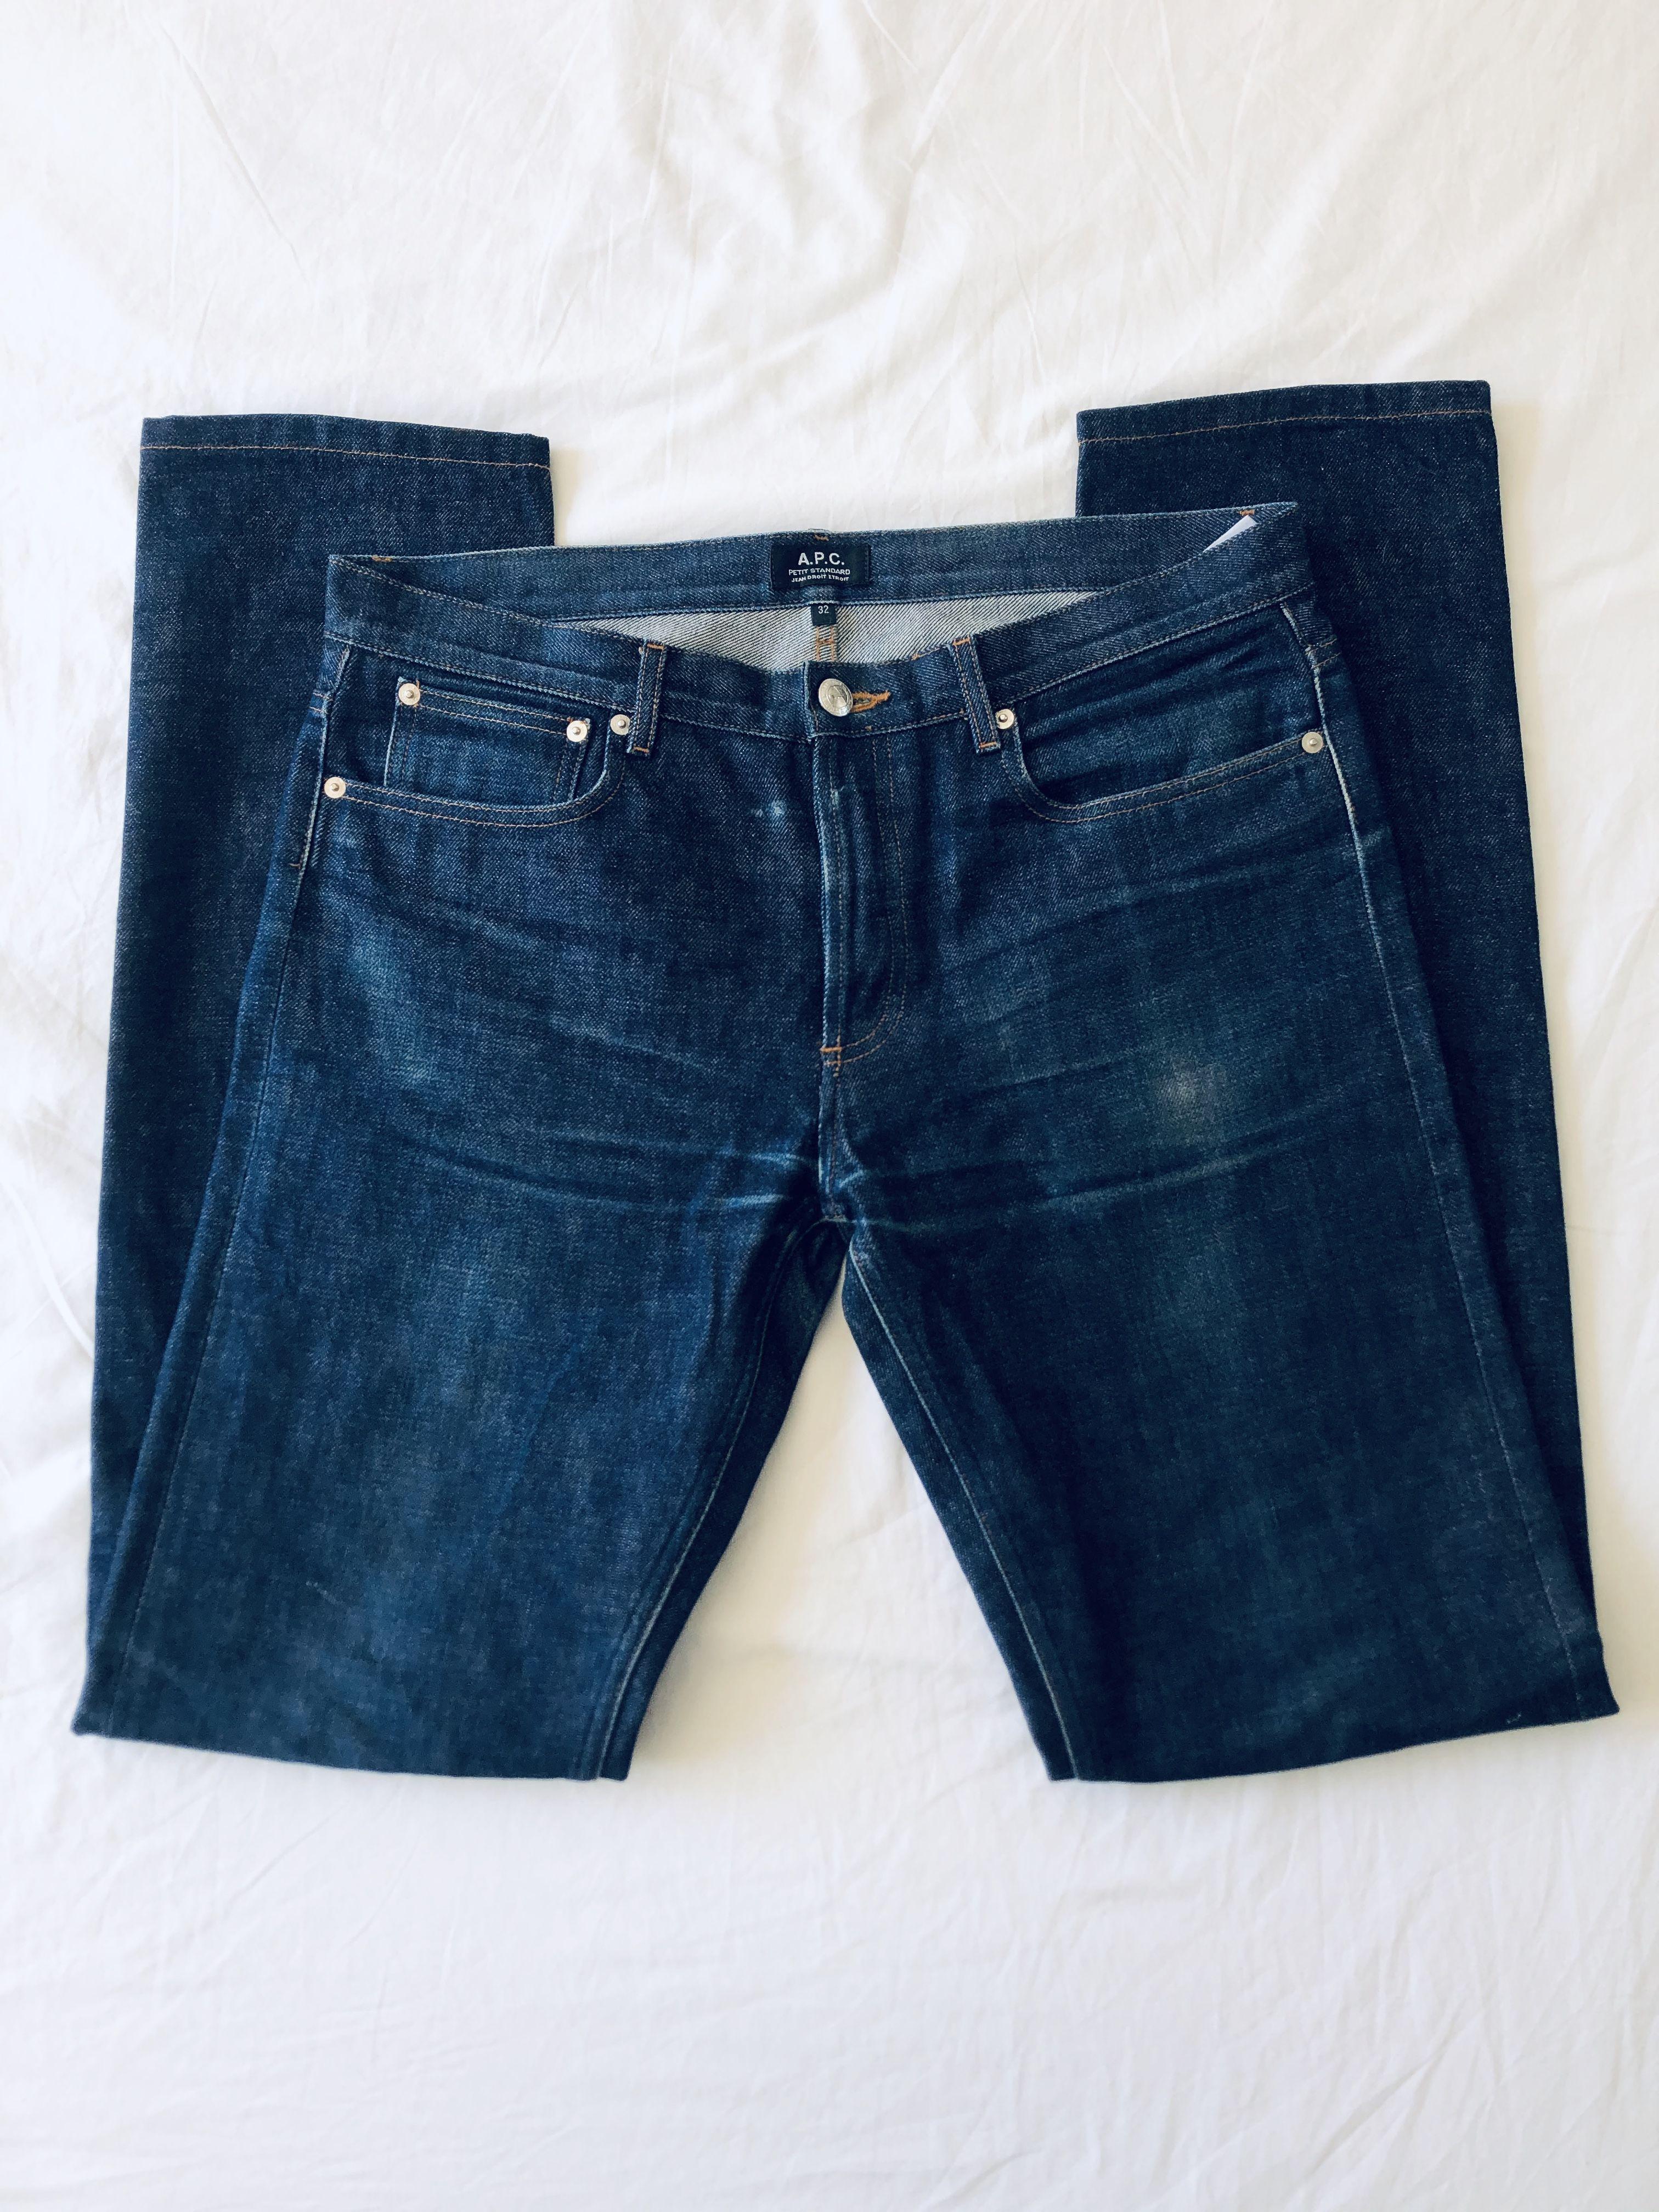 APC Petit Standard Raw Indigo Denim Jeans 32